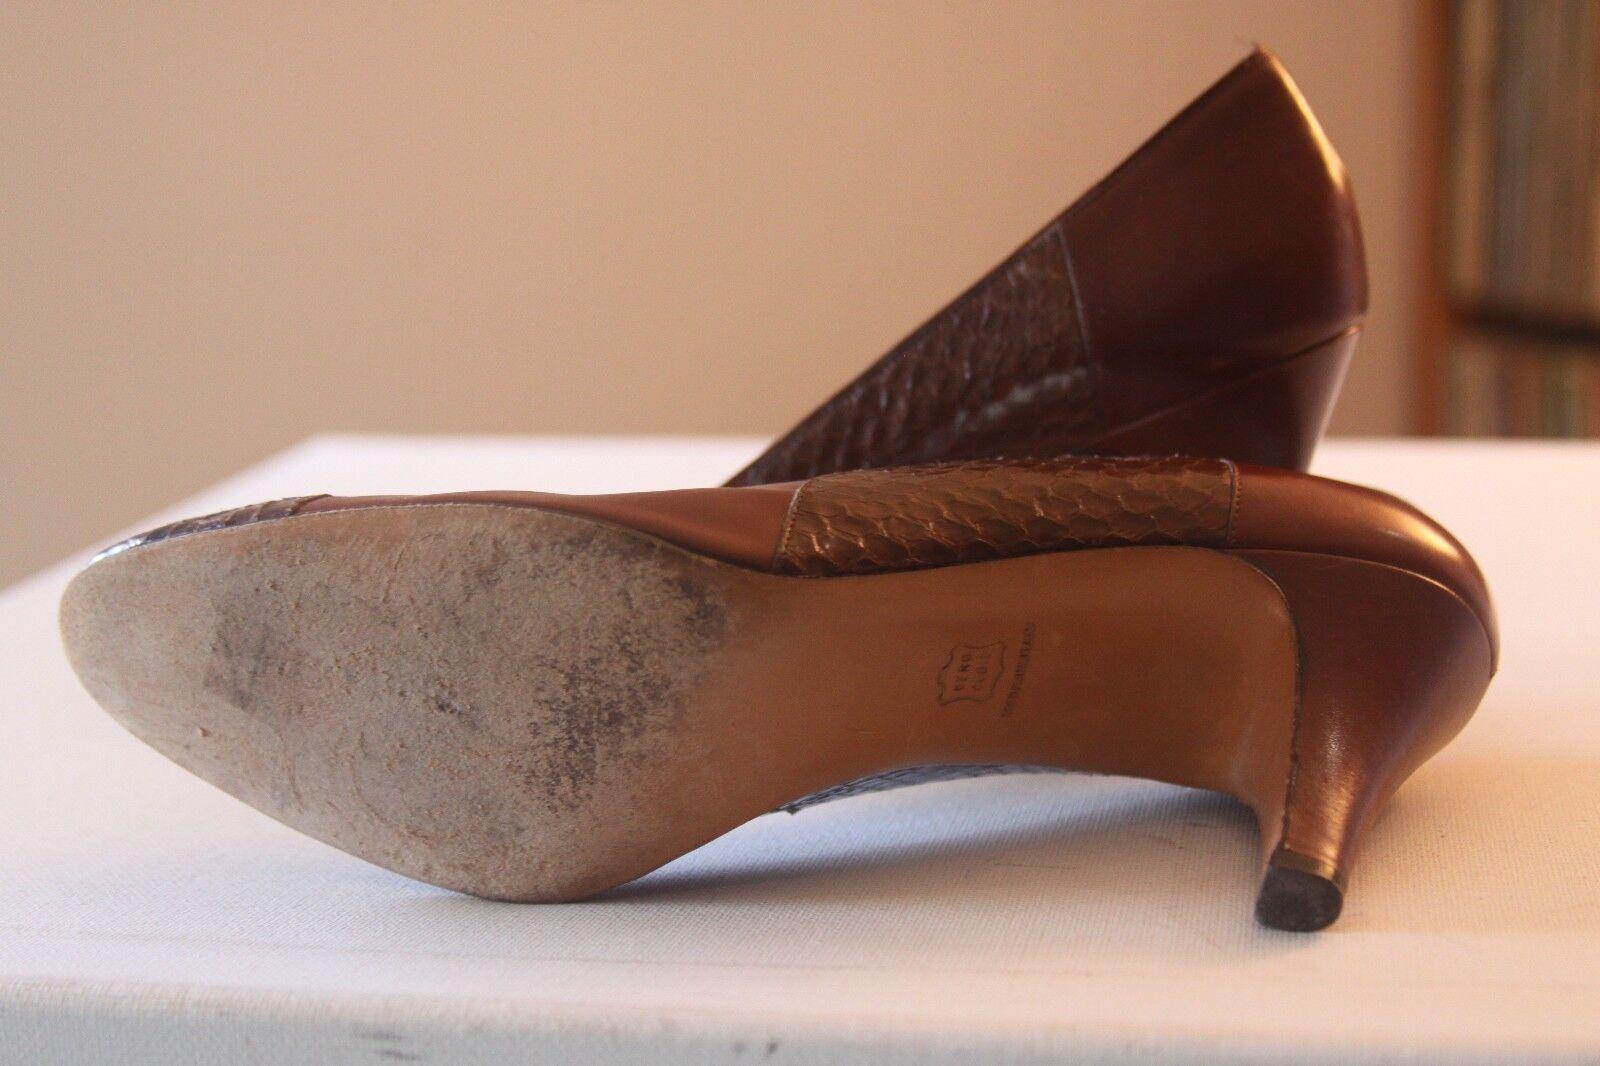 Salvatore Ferragamo Braun Leder Snakeskin 3 Inch Heel Pumps AAAA Größe 7 AAAA Pumps 15c7d4